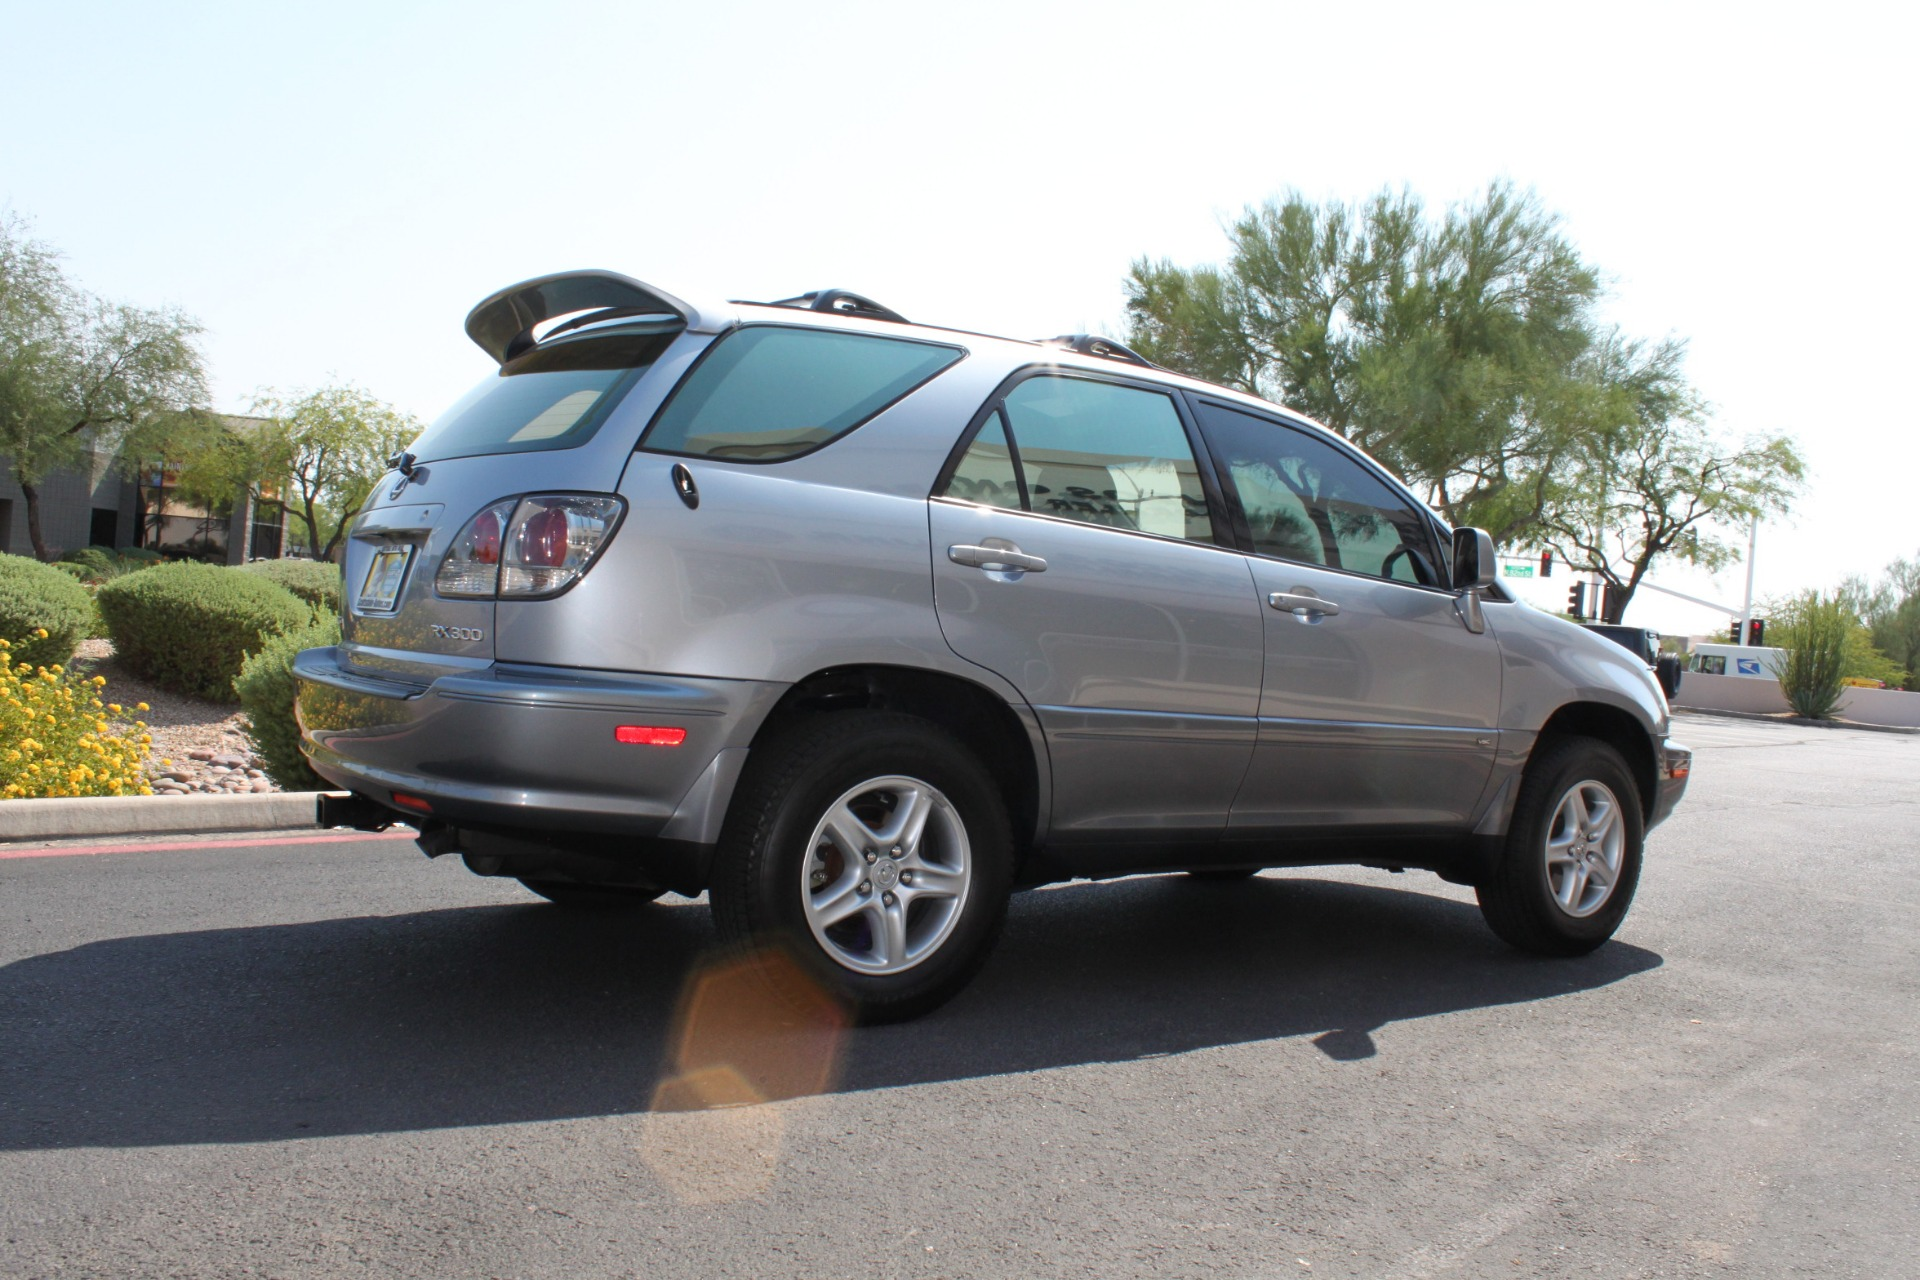 Used-2003-Lexus-RX-300-AWD-Alfa-Romeo